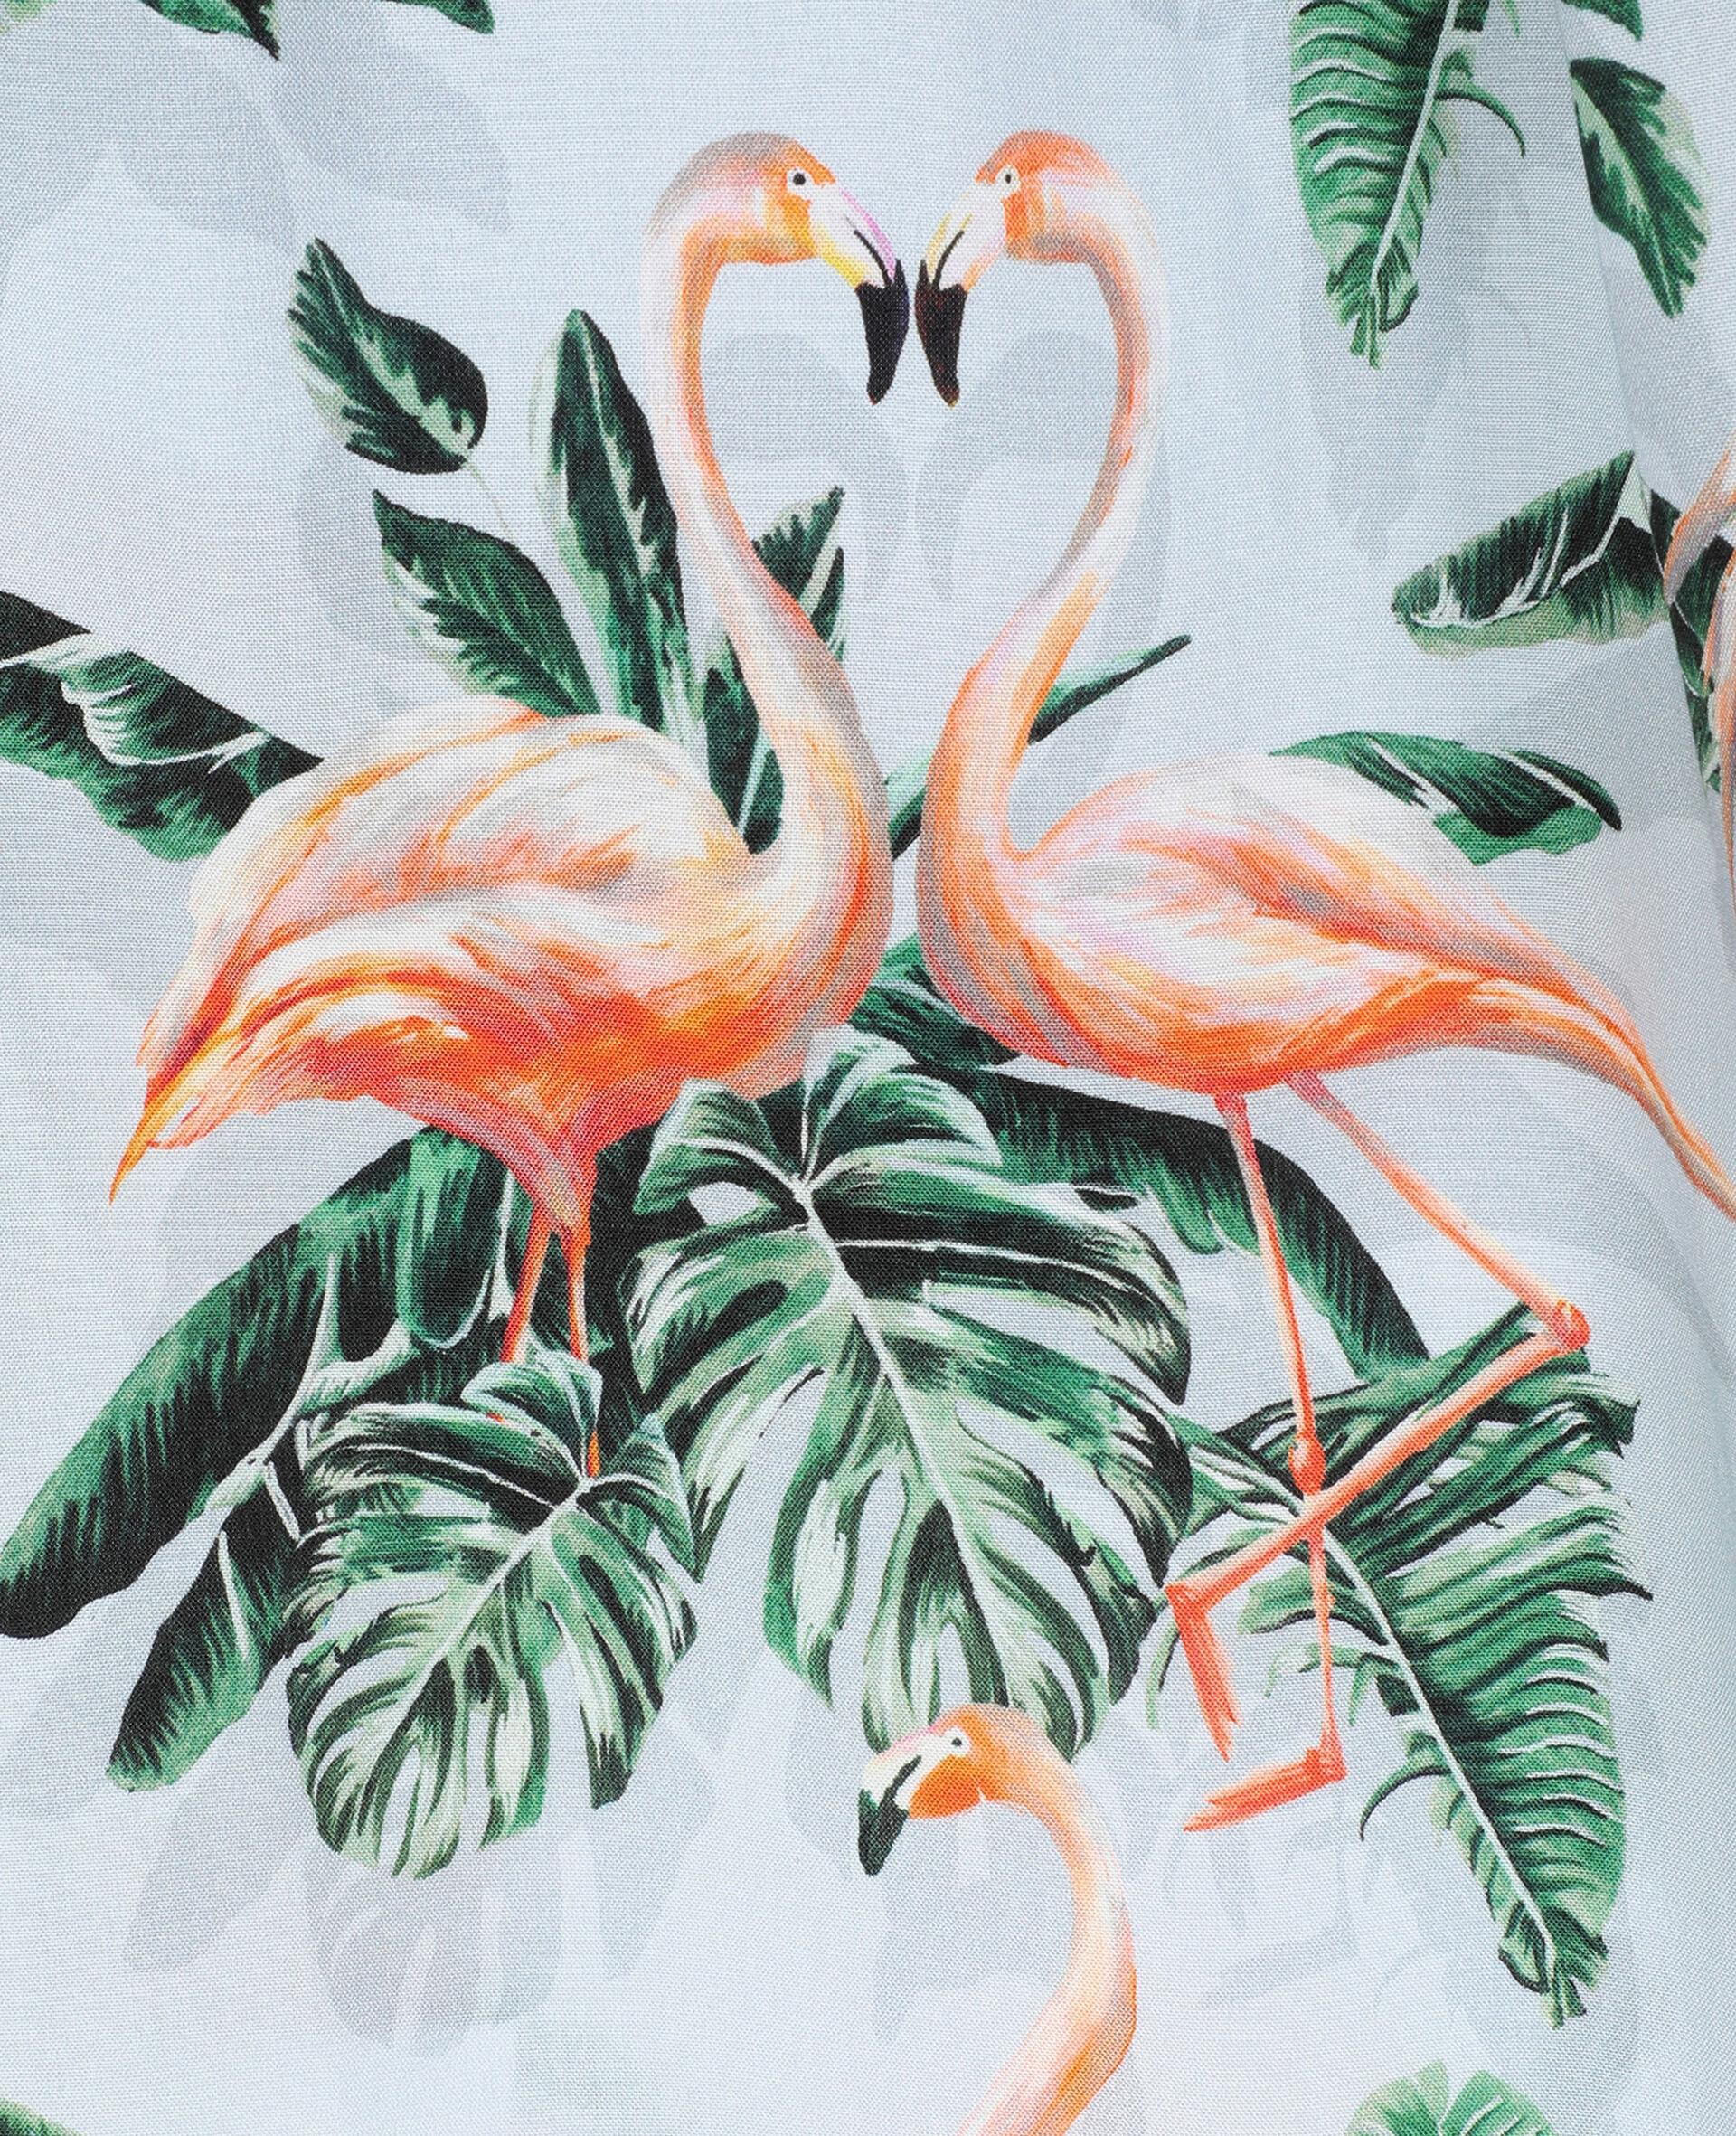 Painty Flamingo粘胶纤维连衣裙-绿色-large image number 1